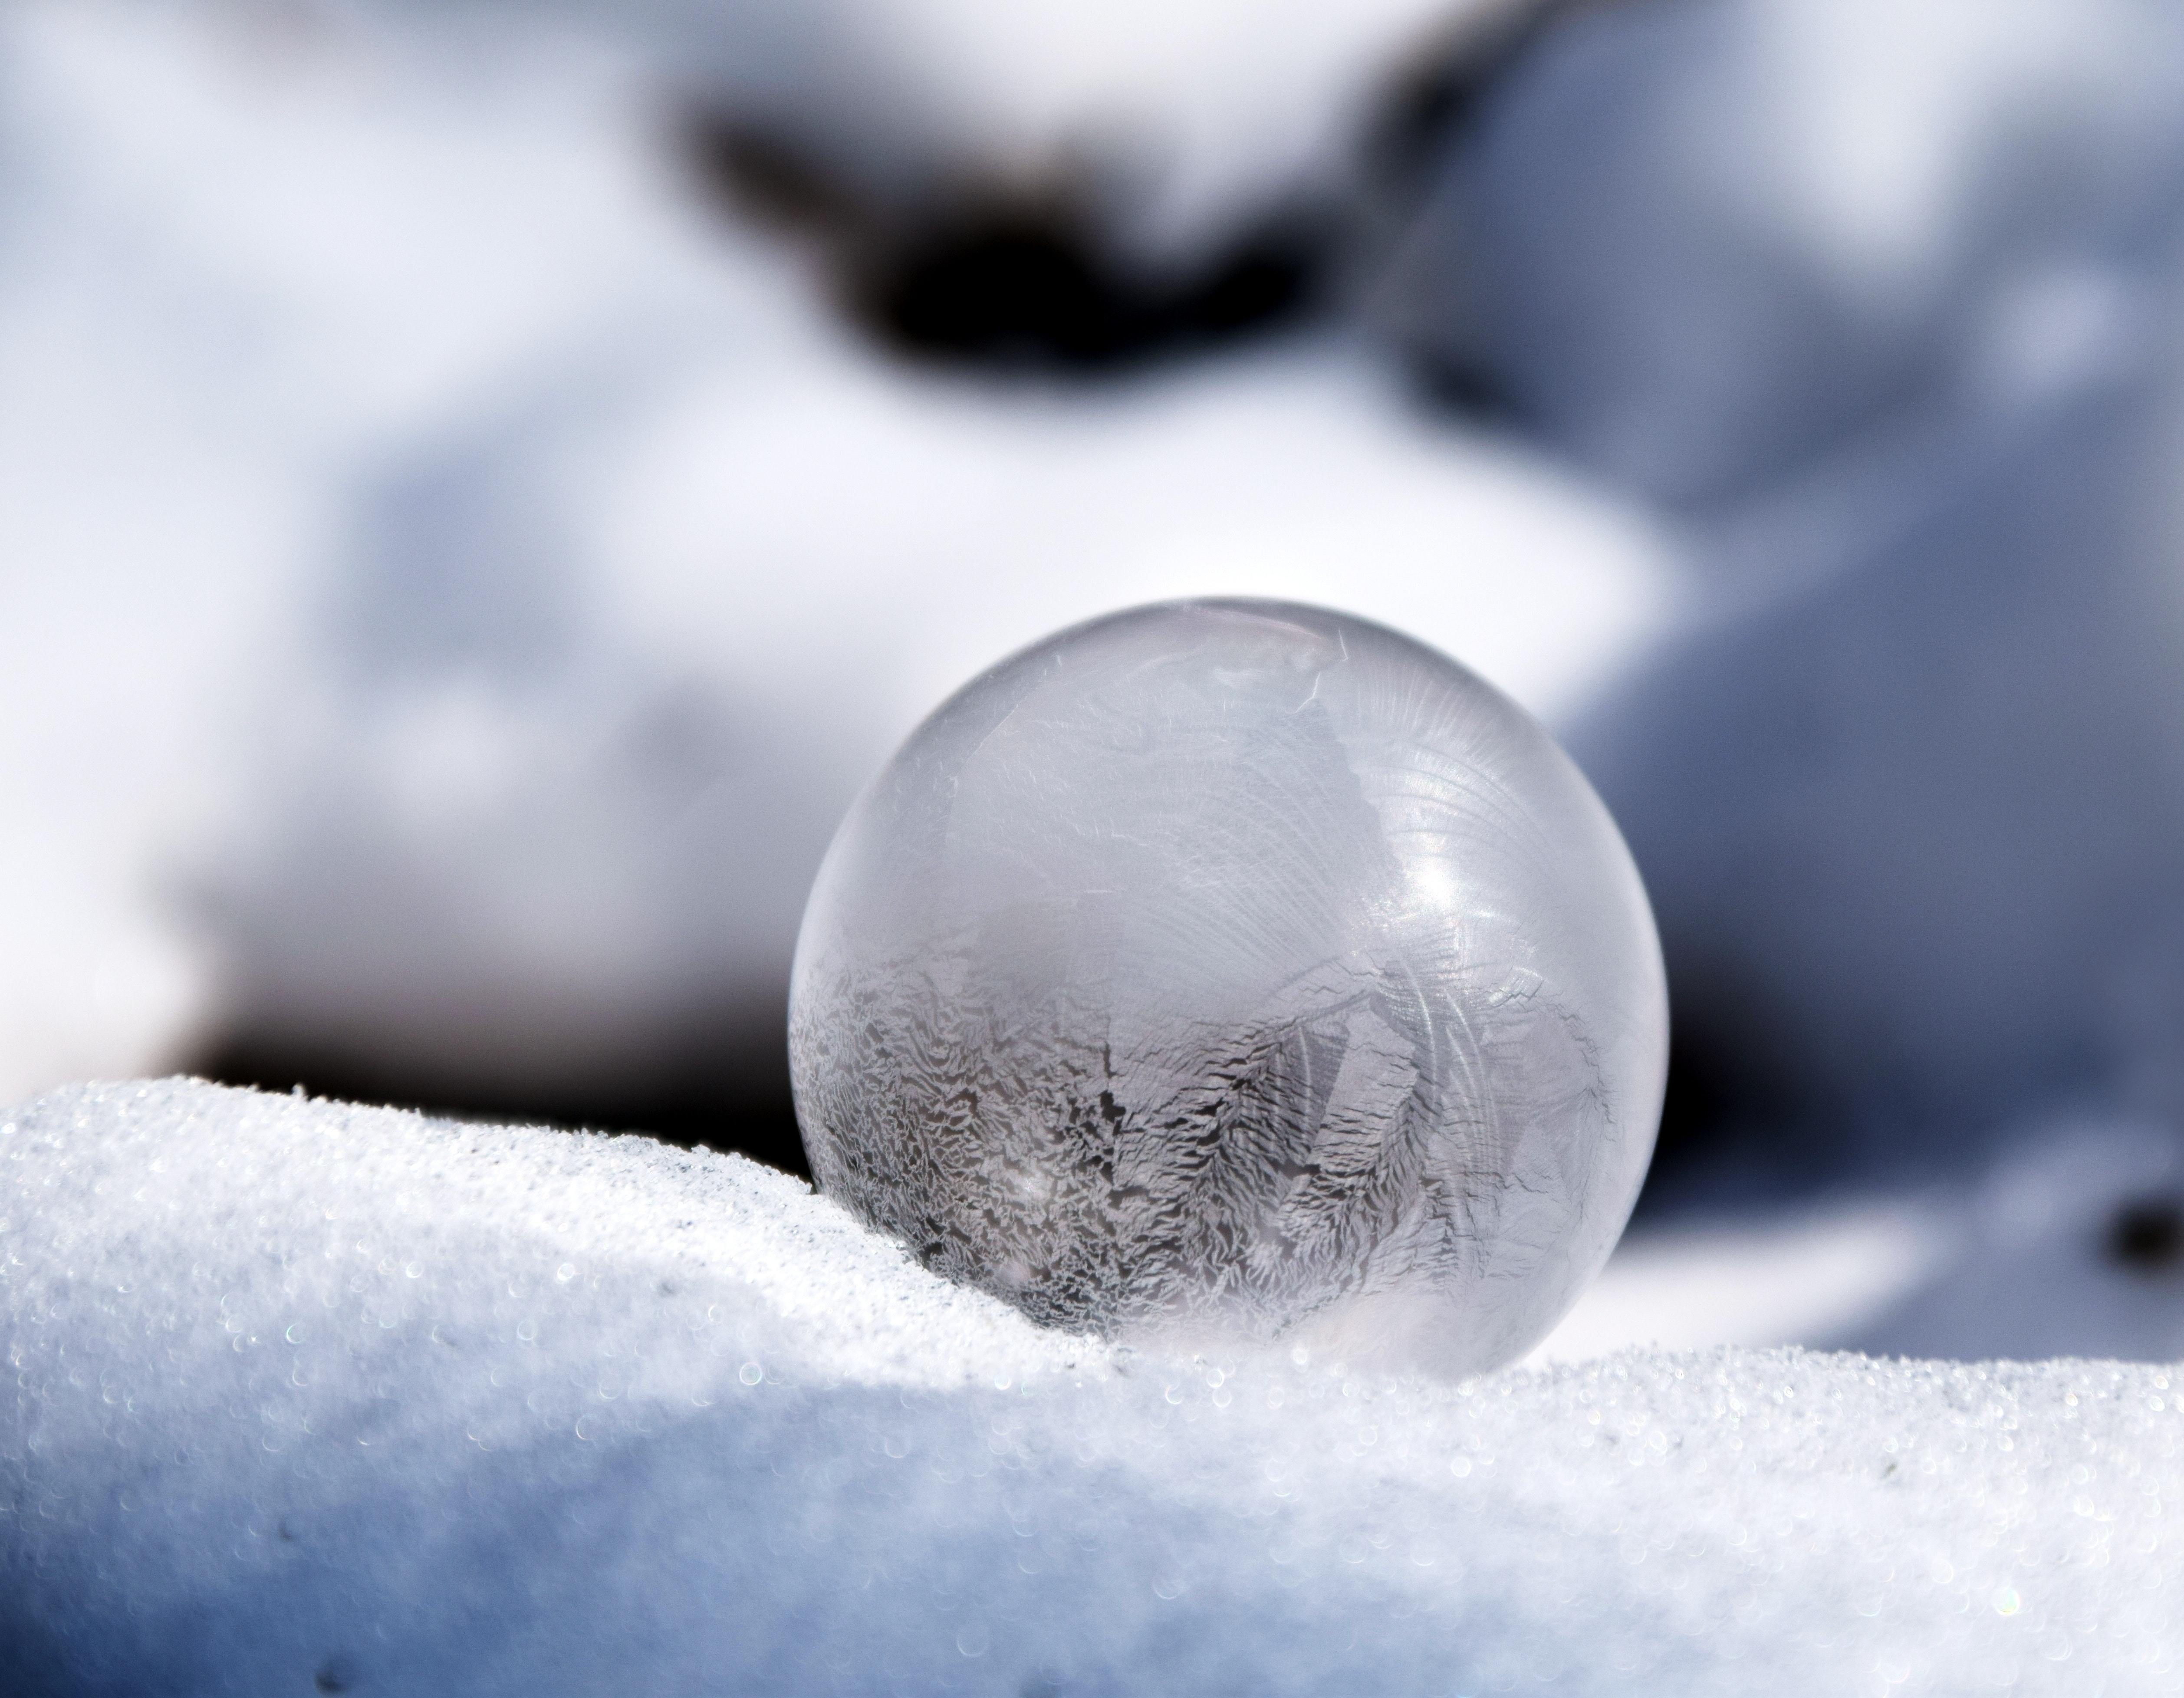 abstract-ball-beautiful-blur-314956.jpg